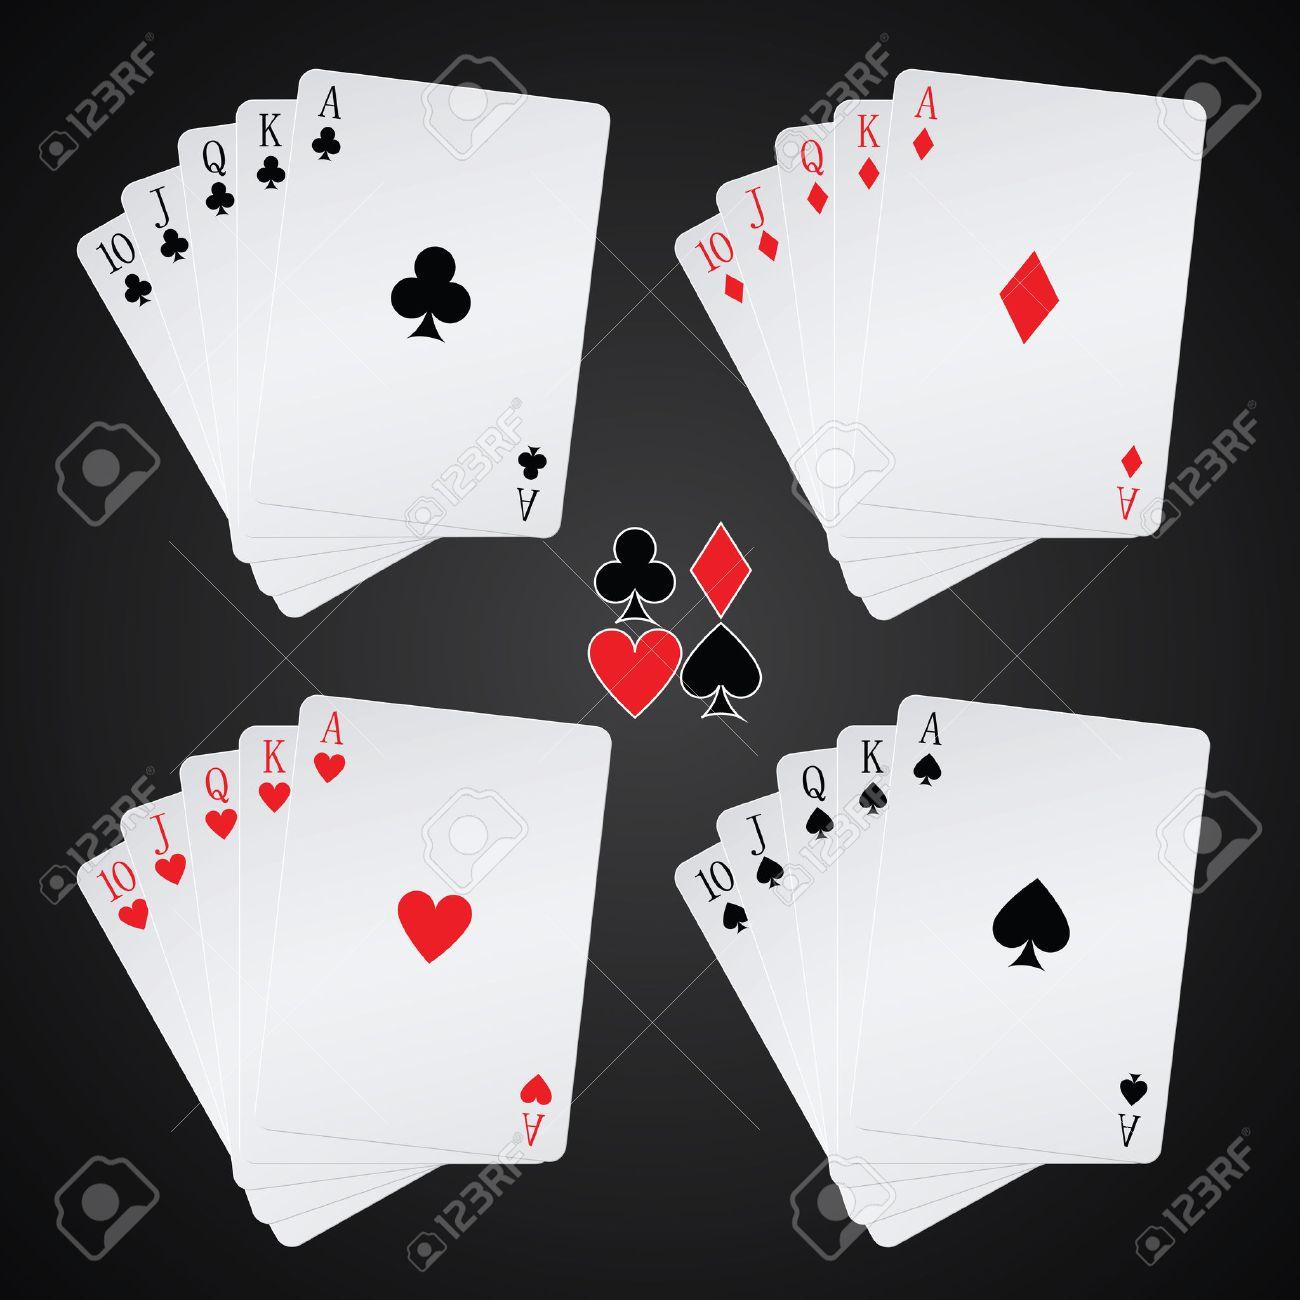 royal flush playing cards on black background - 22448648